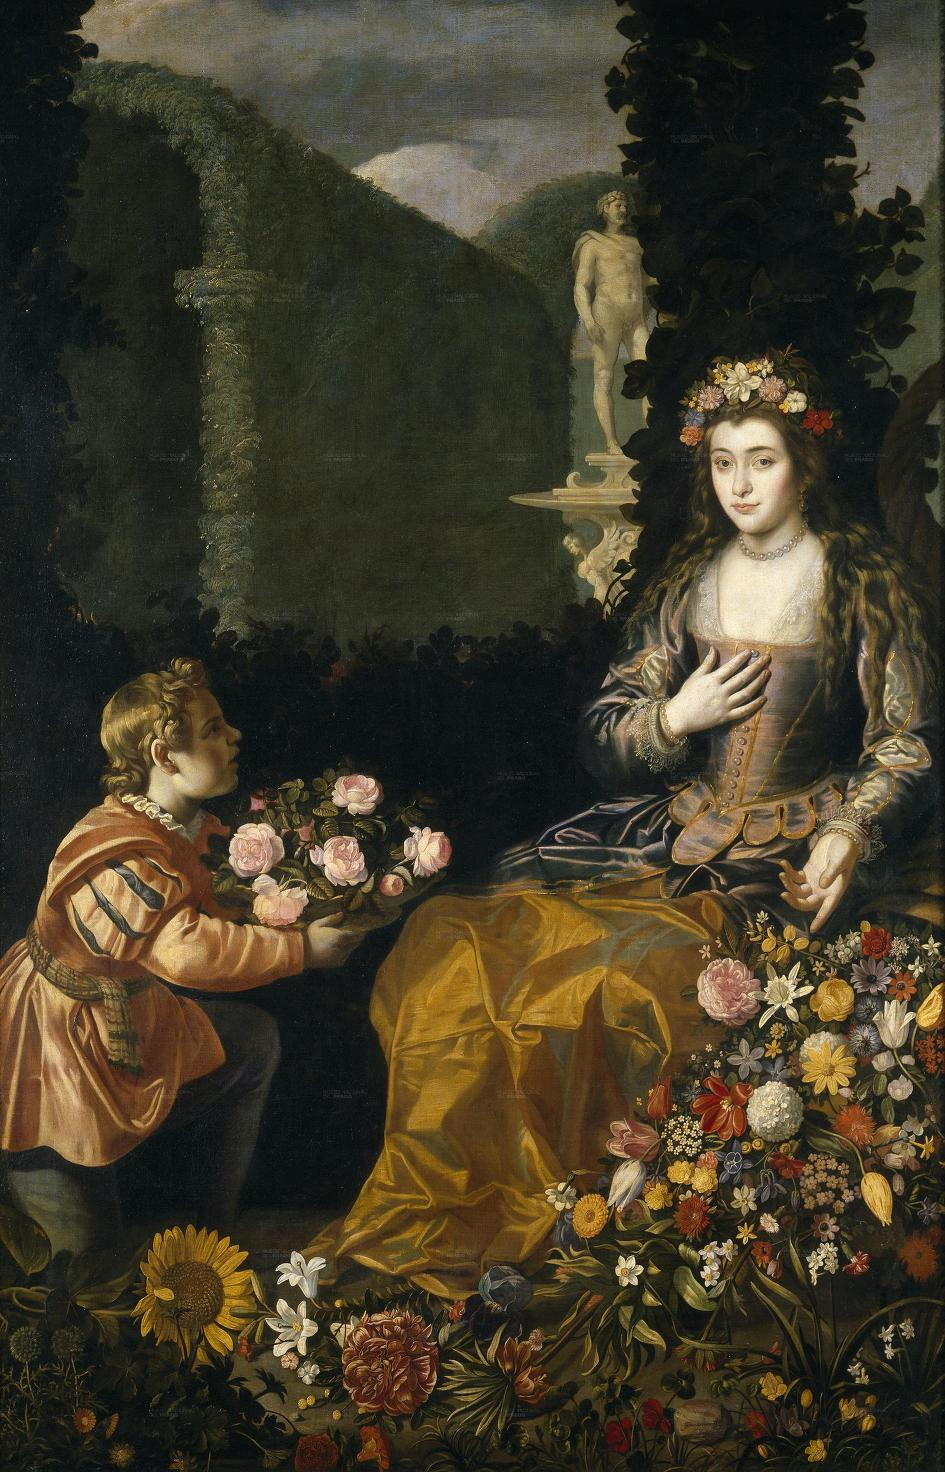 van der Hamen 1627_Offering_a_Flora Prado